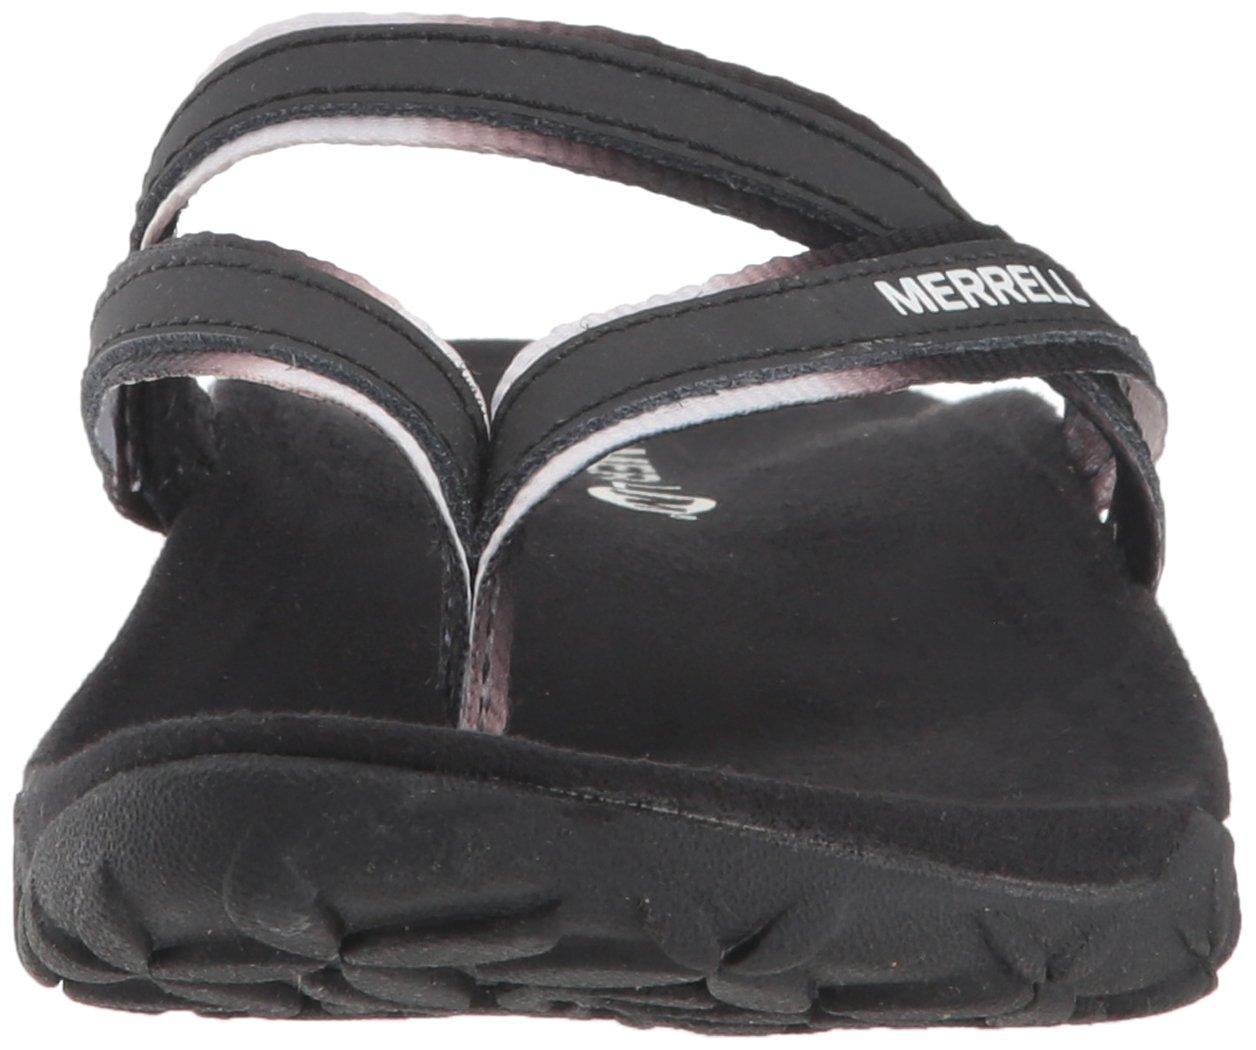 Merrell Women's Terran Ivy Post Sport US|Black Sandal B078NH5Y5M 8 B(M) US|Black Sport 544fec